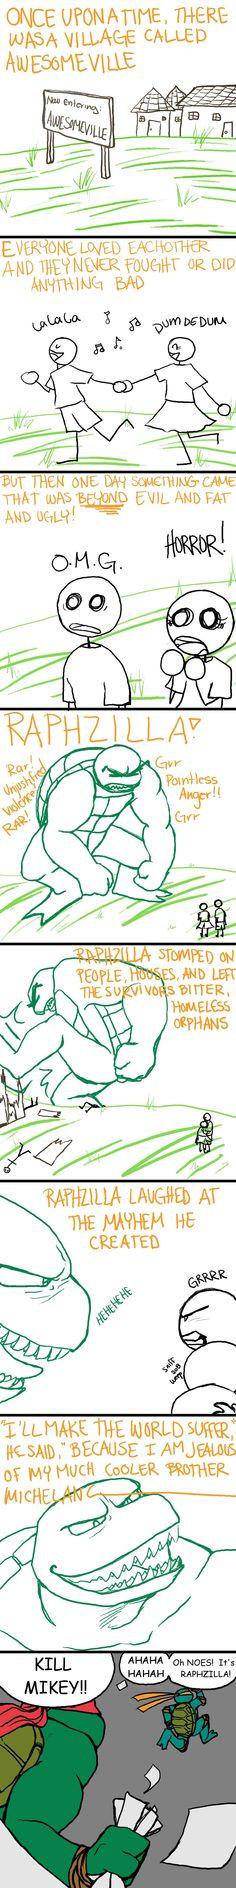 Raphzilla Comic by iceicefangurl.deviantart.com on @deviantART